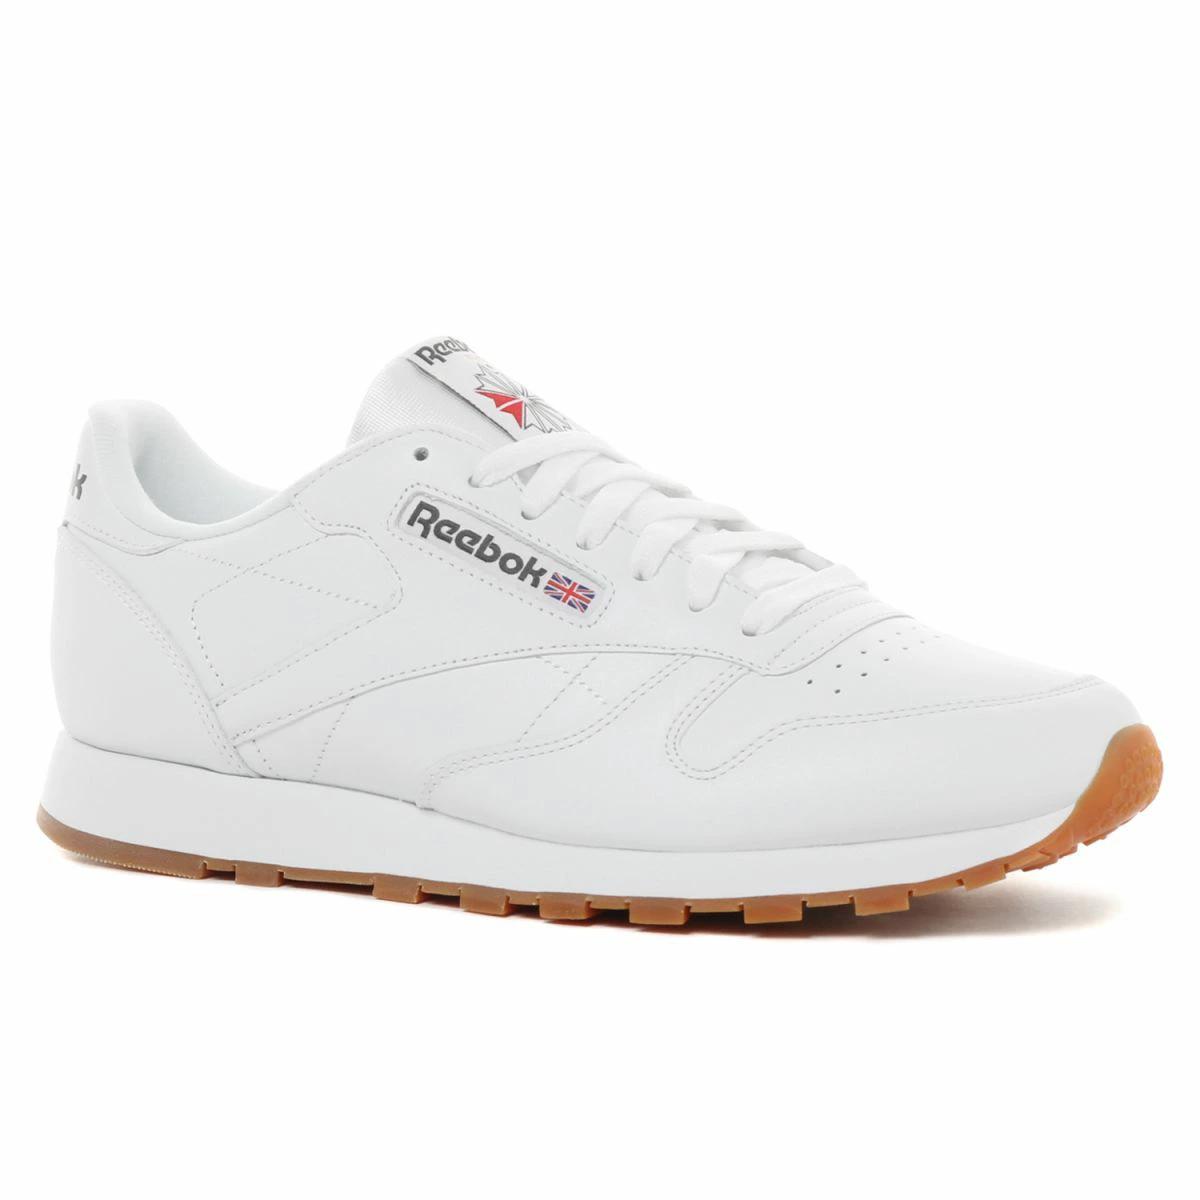 f:id:shoesmaster:20210217141522p:plain